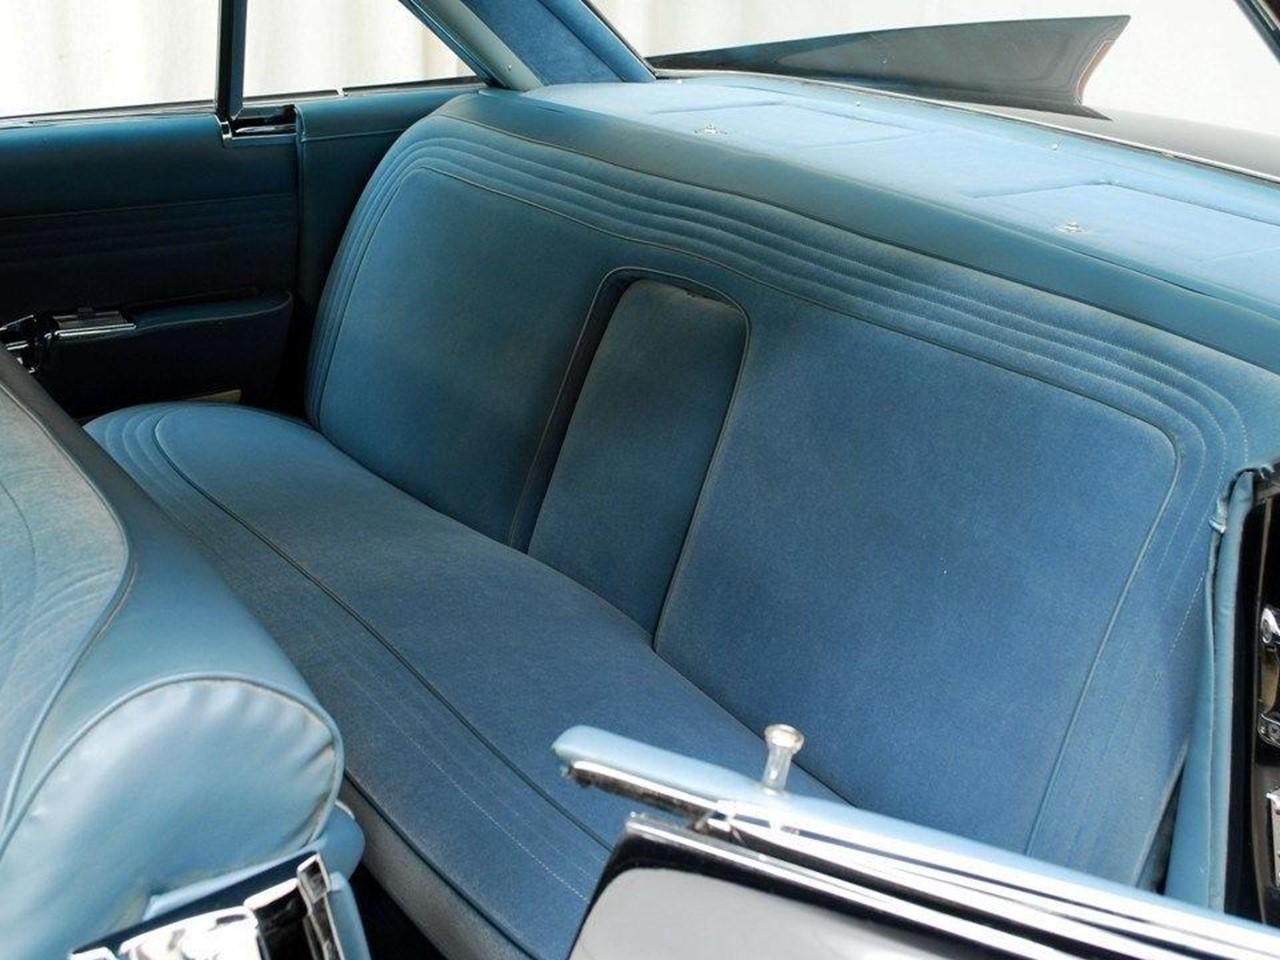 1959 Series 6900 Eldorado Brougham 4